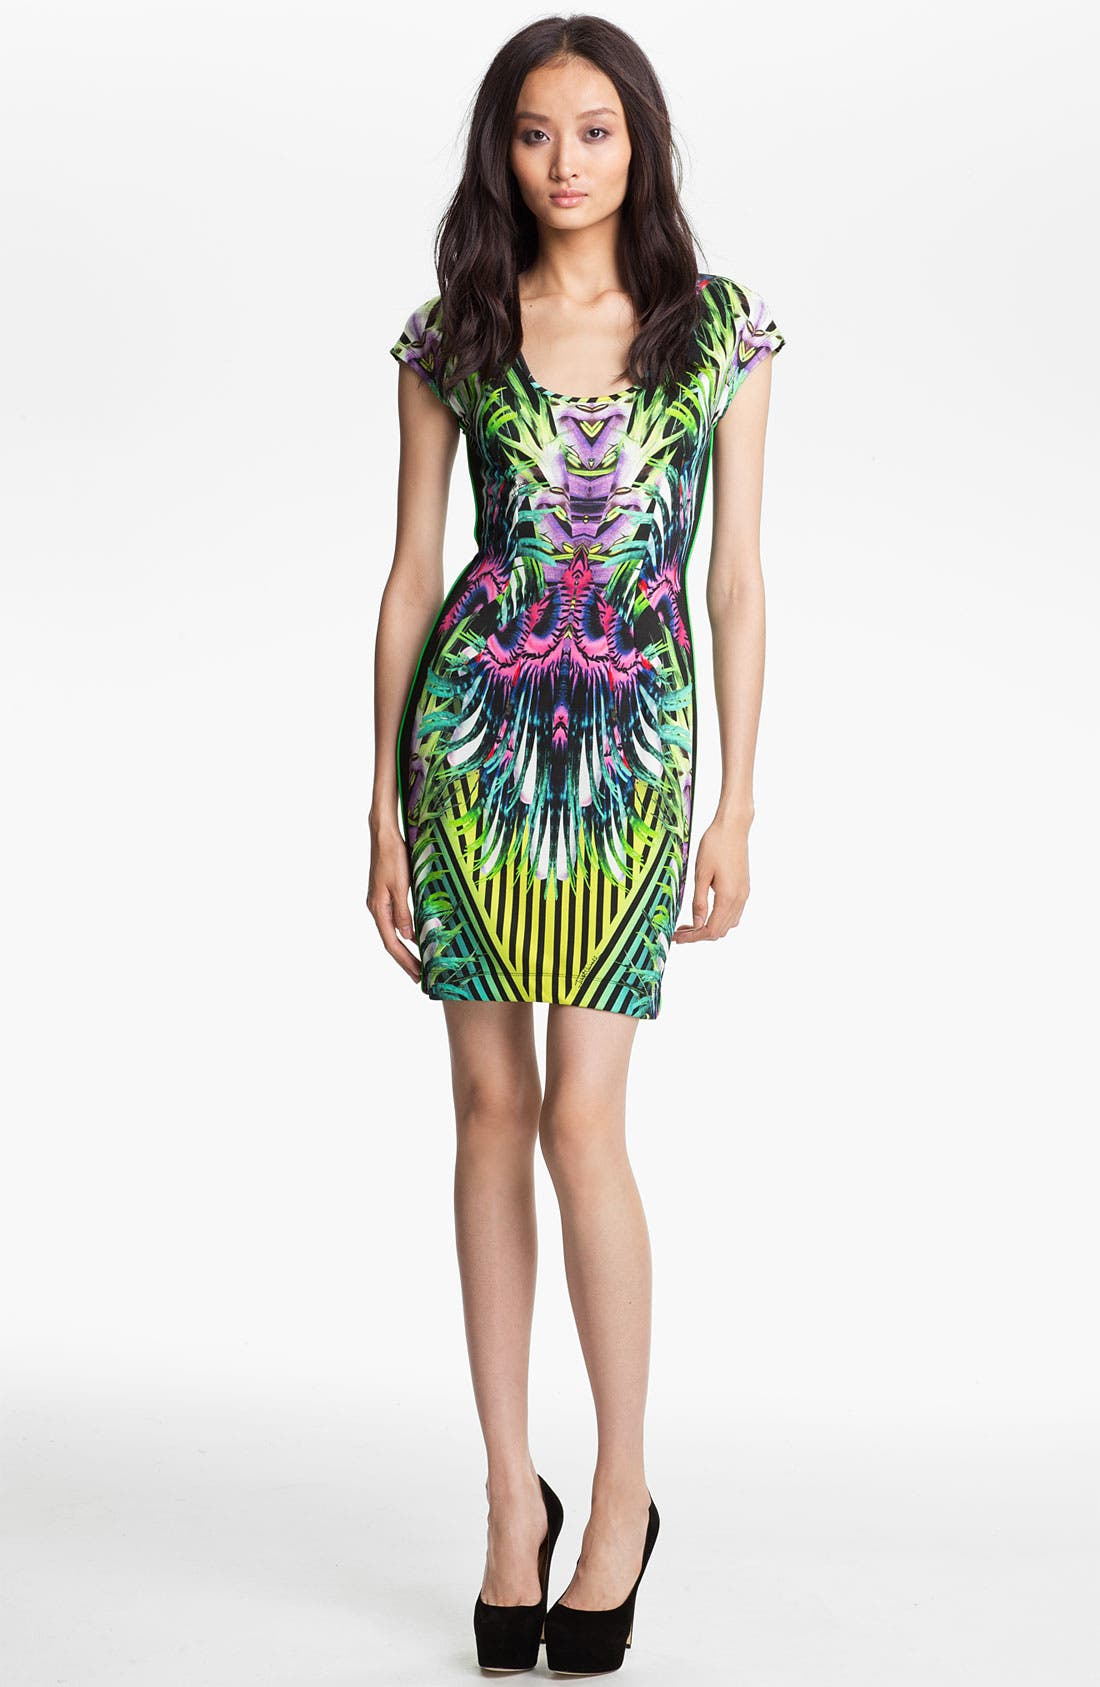 Main Image - Just Cavalli 'Jungle' Jersey Dress